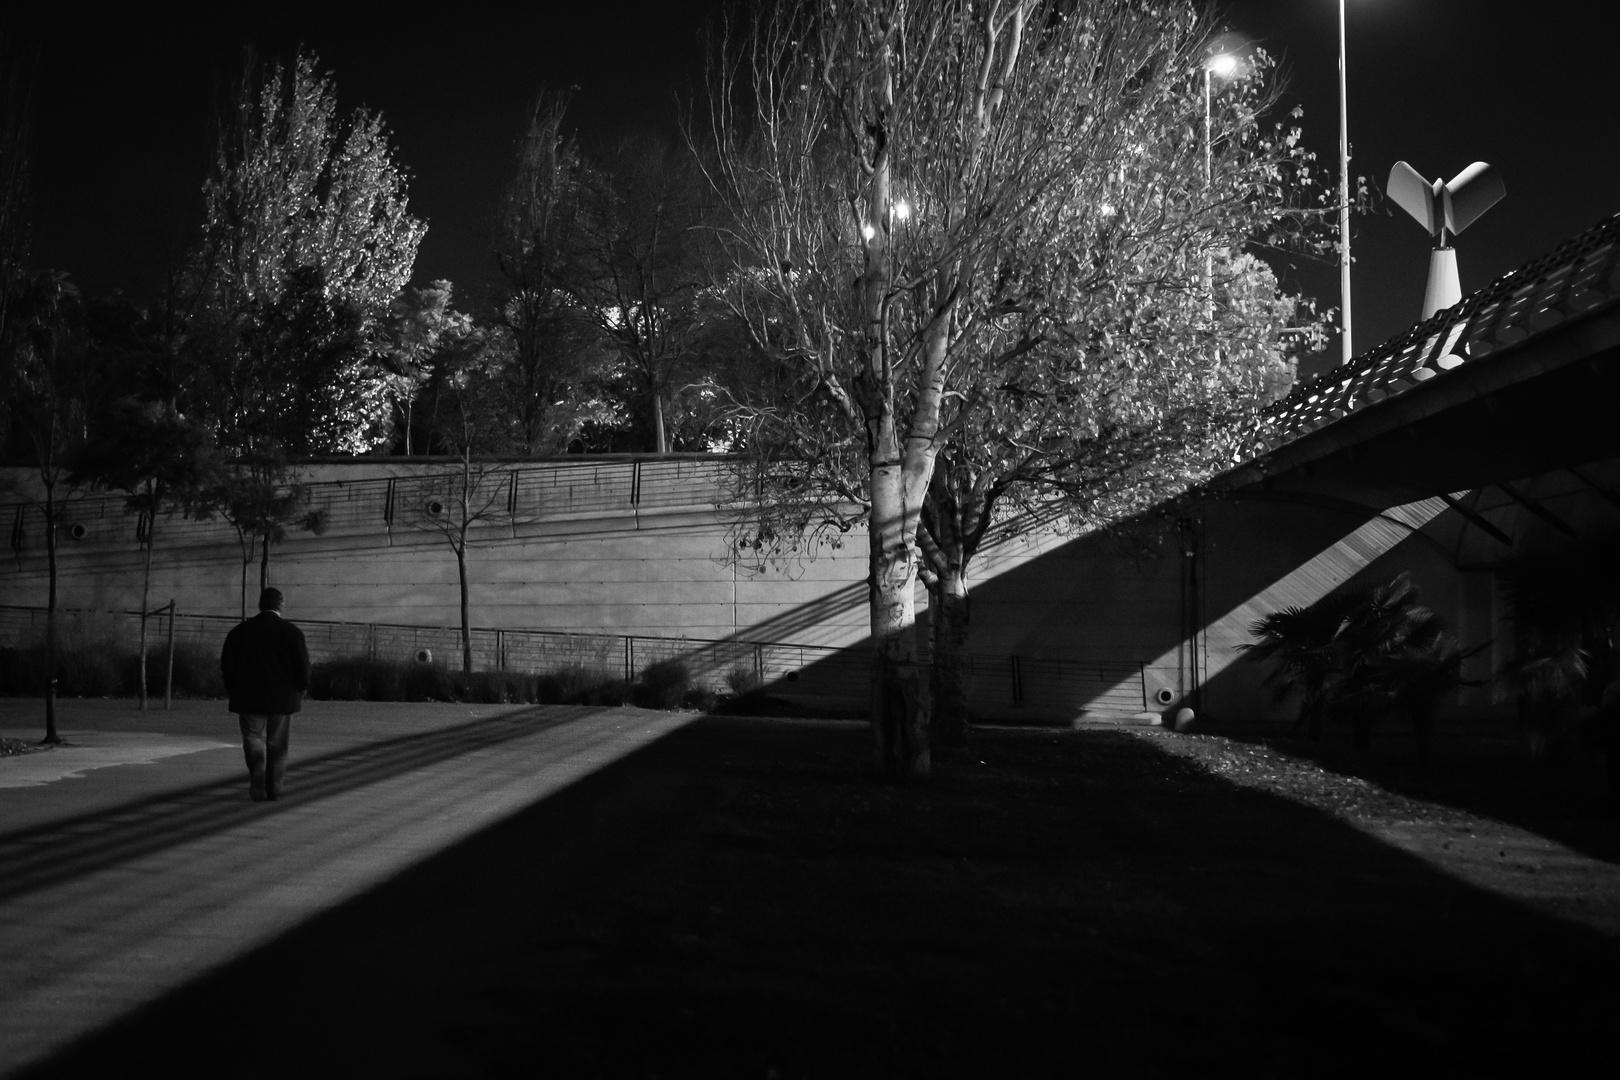 night's angel departing